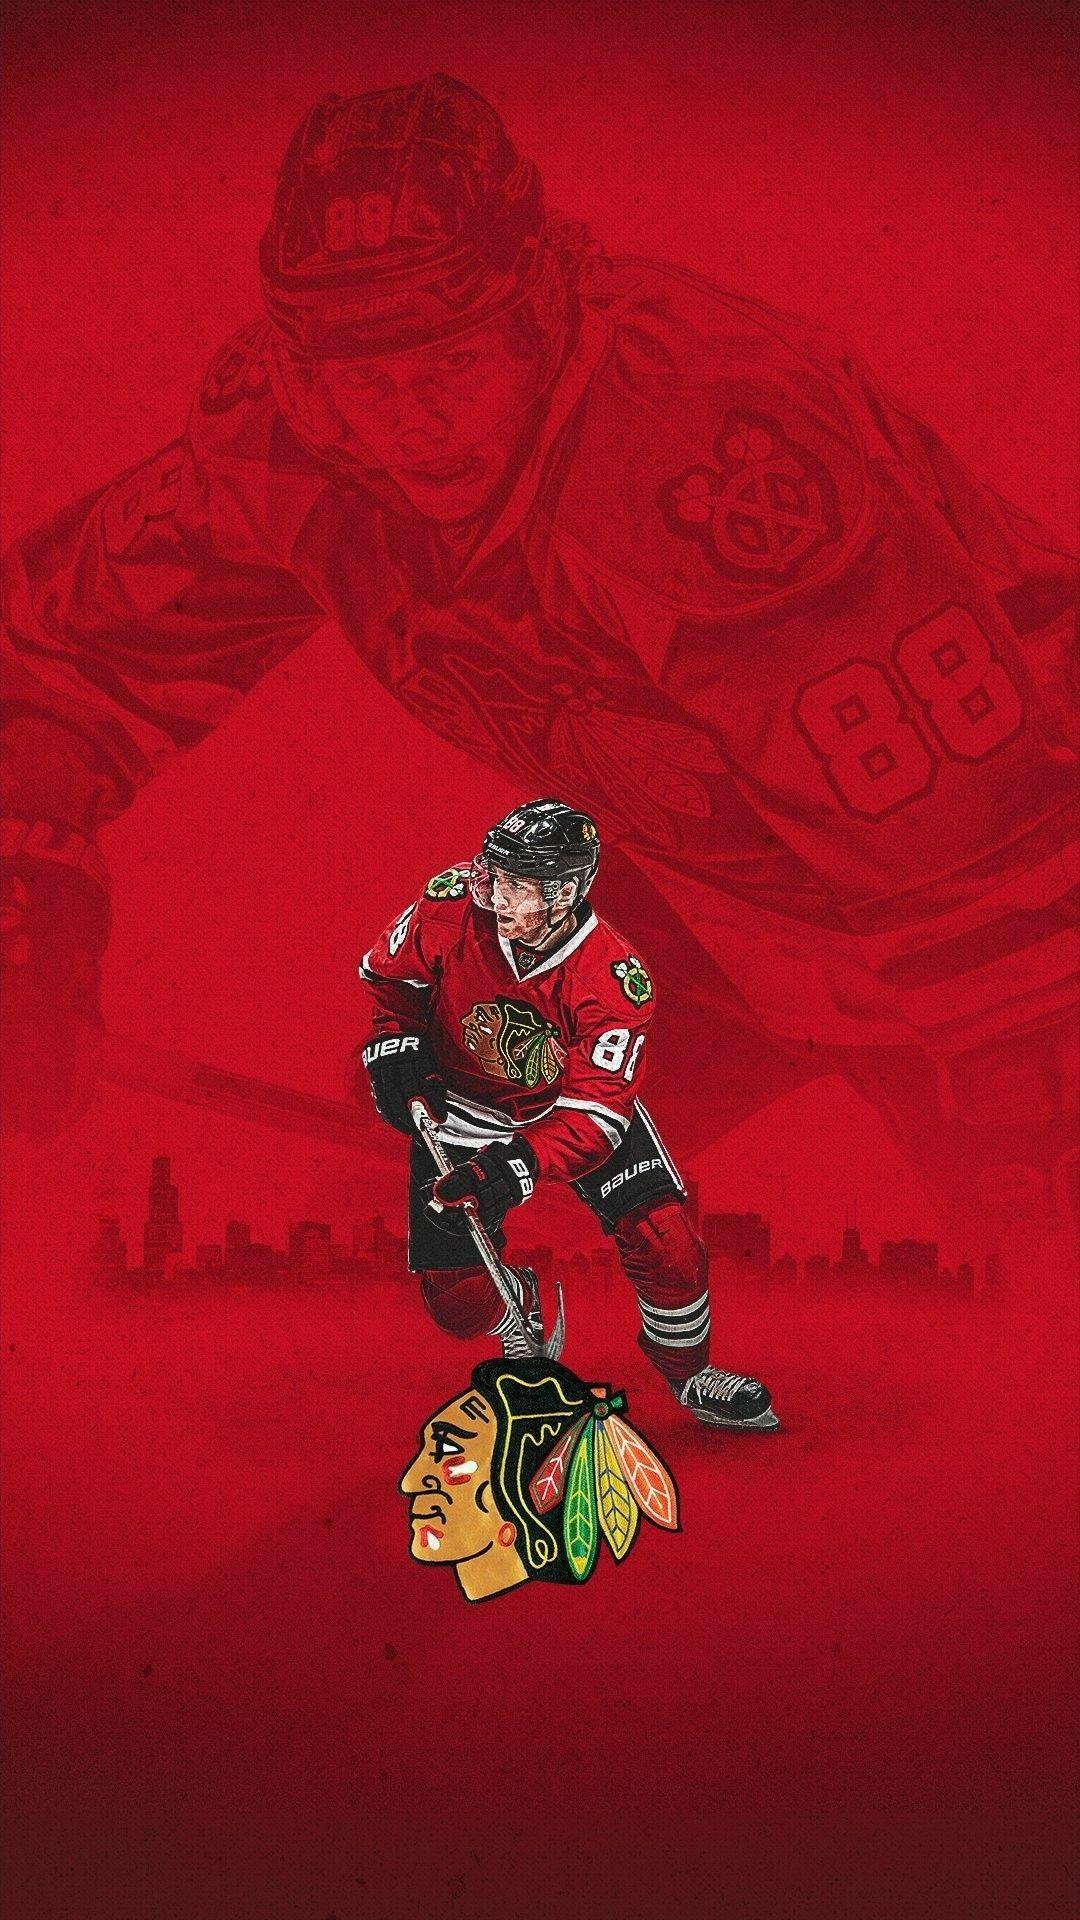 CHICAGO SPORTS TEAM ART Chicago blackhawks wallpaper